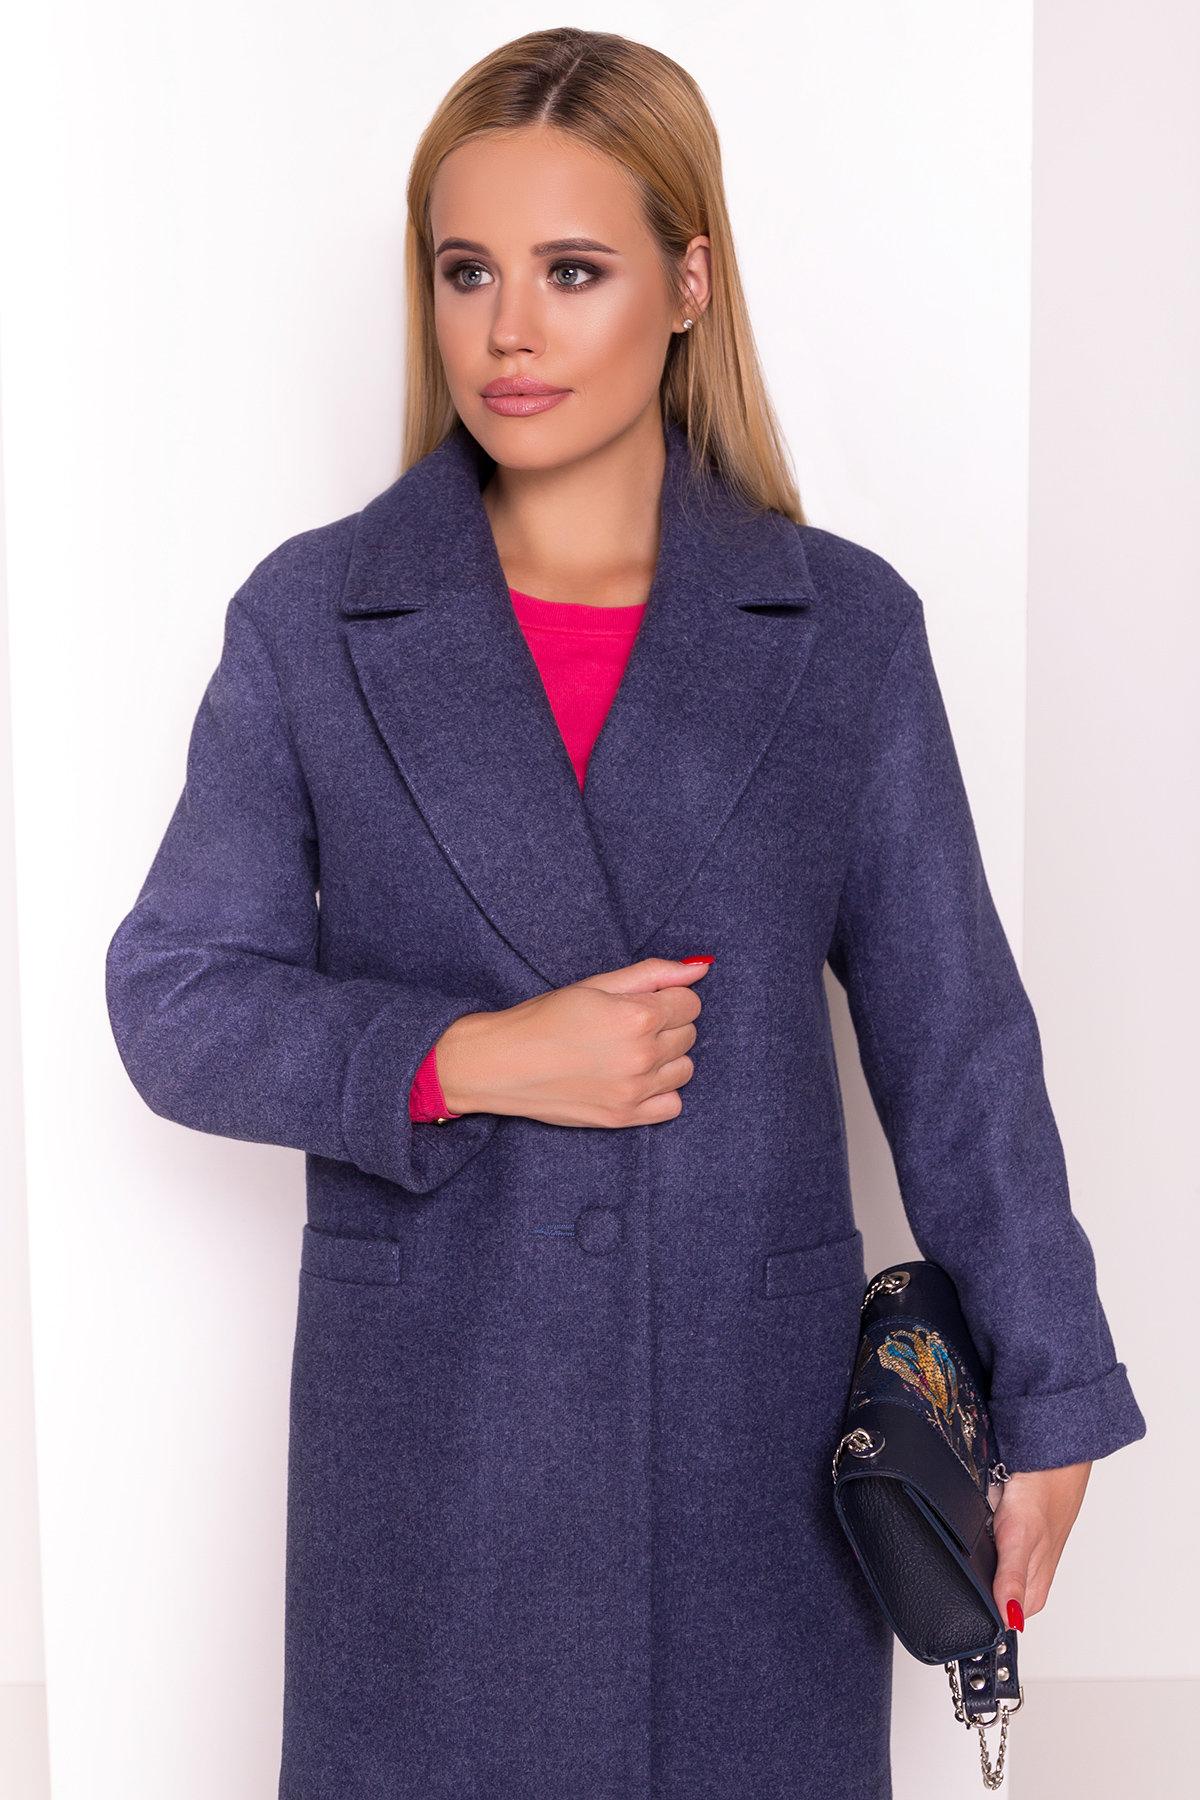 Пальто Вива 4558 АРТ. 37263 Цвет: Джинс - фото 3, интернет магазин tm-modus.ru